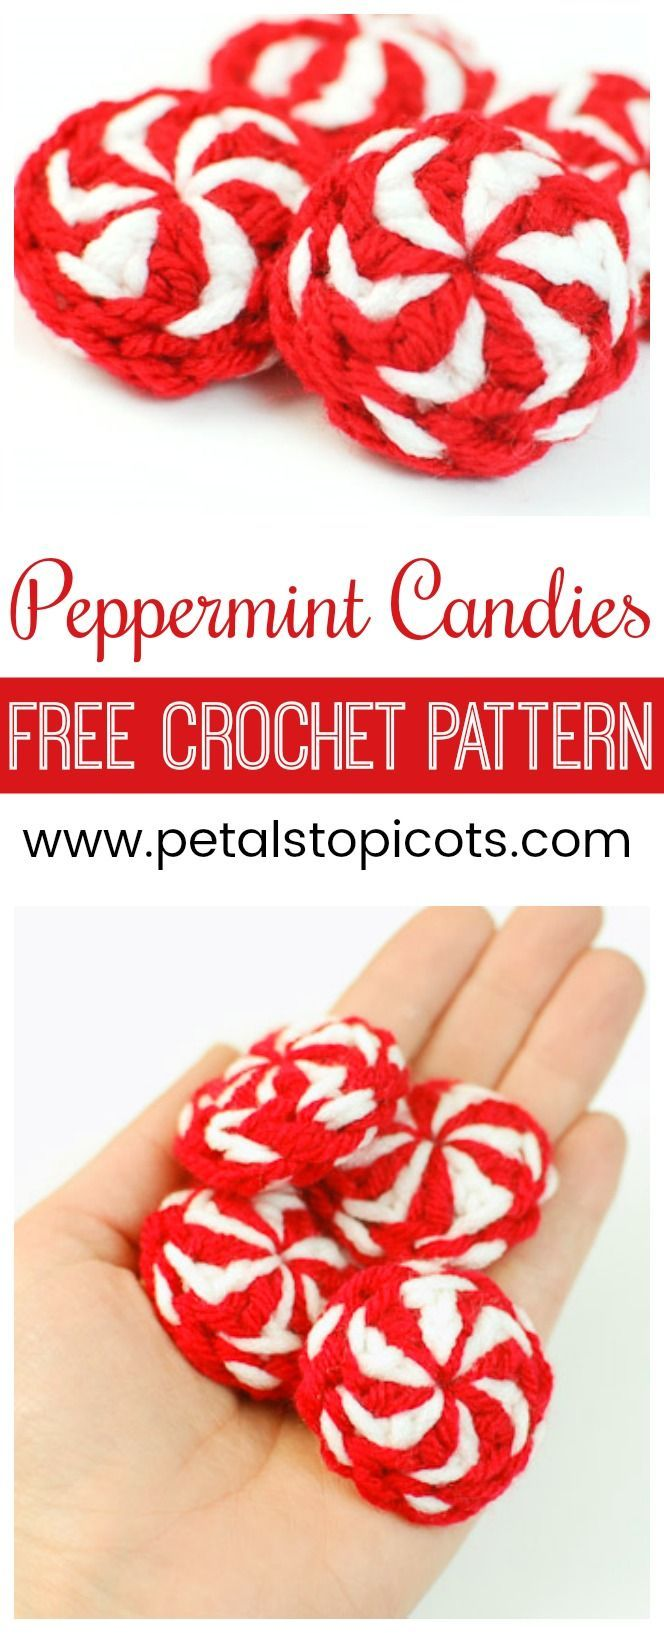 Peppermint Candy - Free Christmas Crochet Pattern | CrochetHolic ...